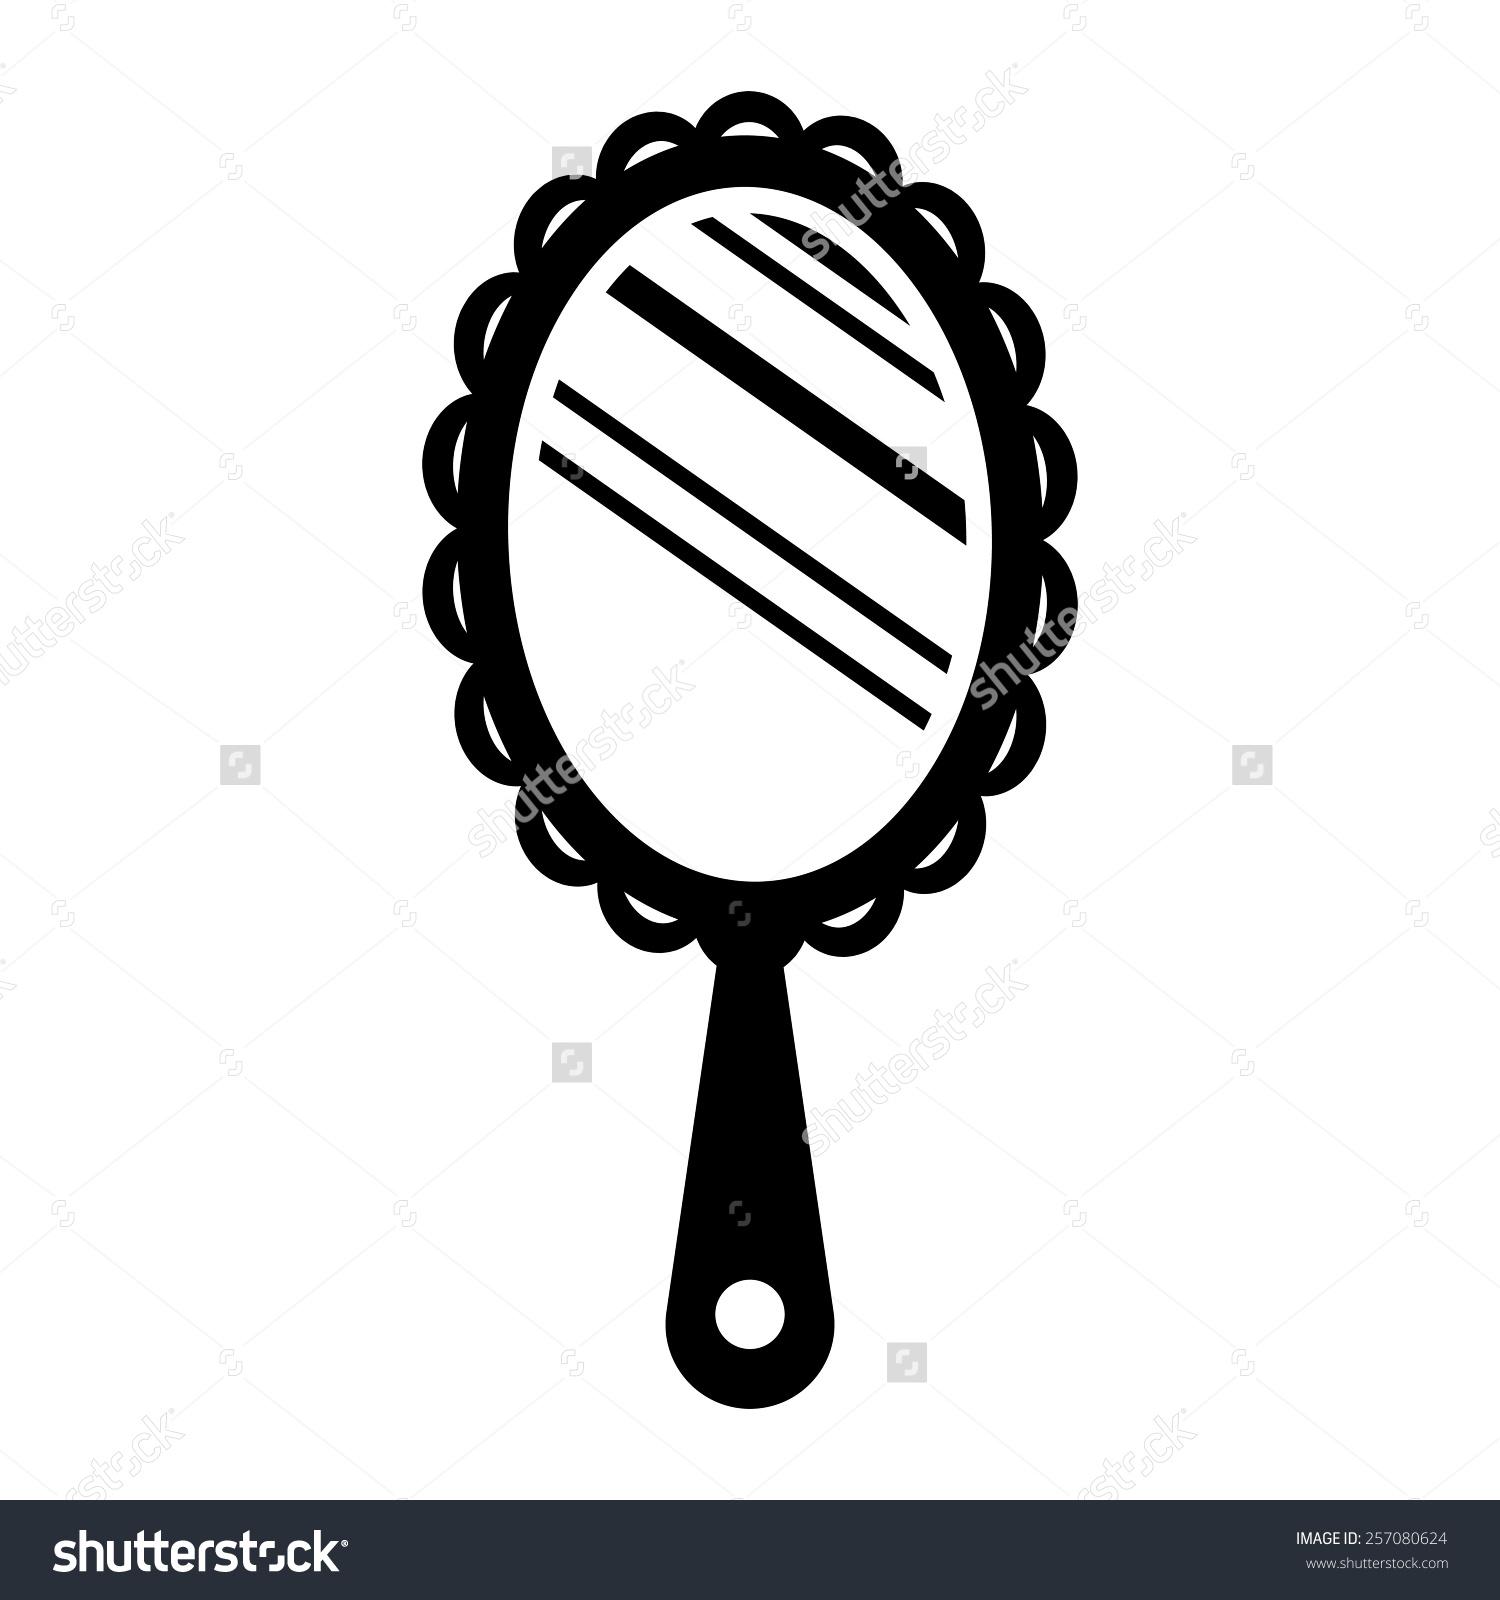 Black Hand Mirror. aa27367a7cce25913d9b0c78bbe910 .